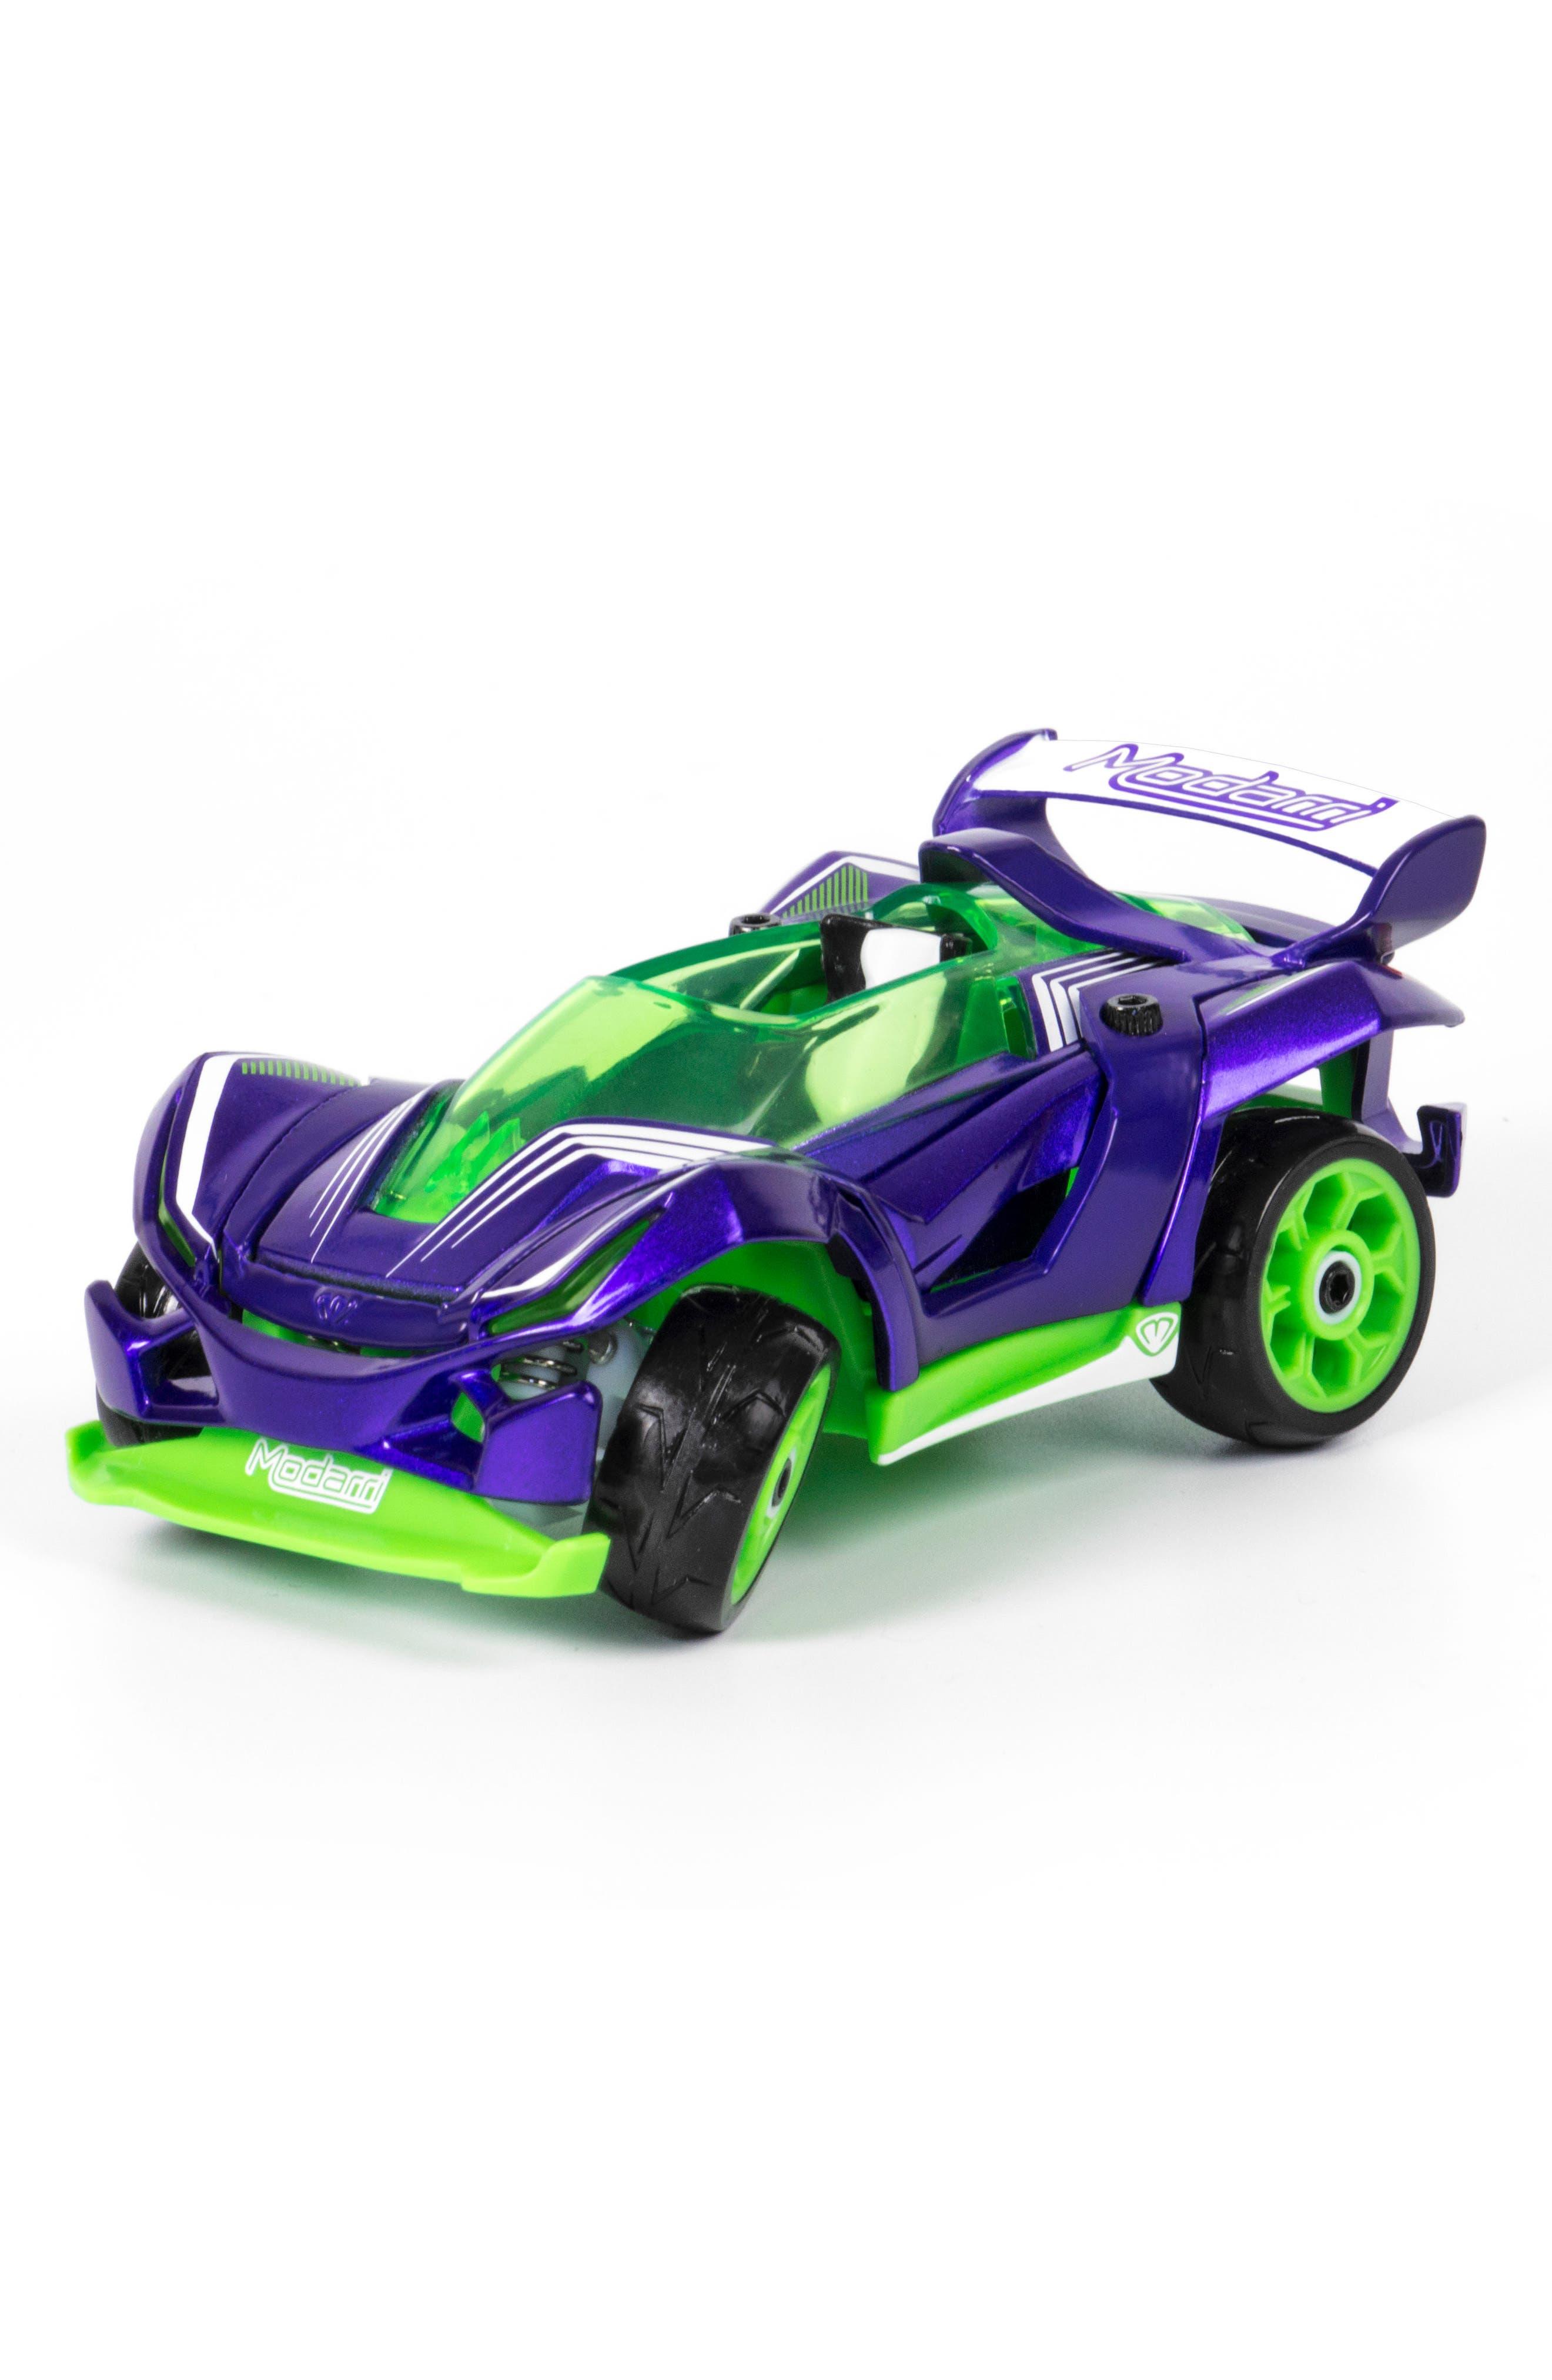 Modarri Delux C1 Concept Car Kit